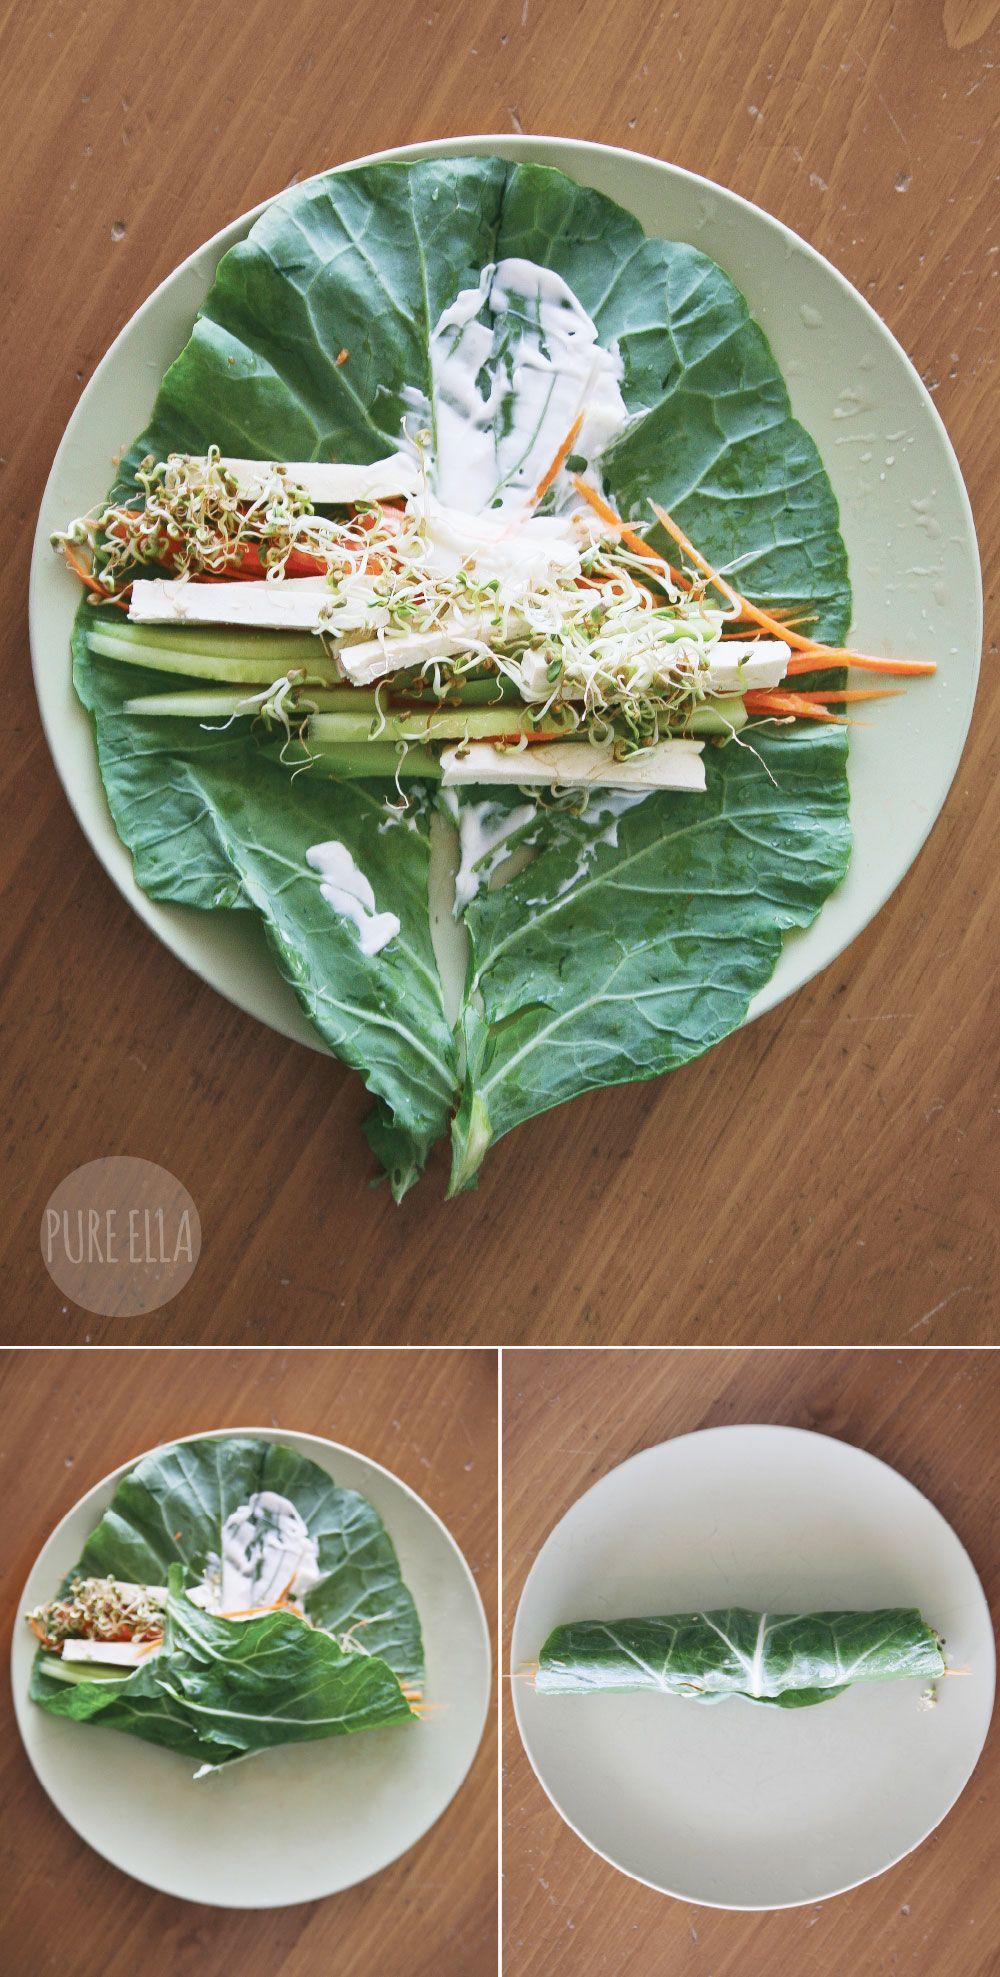 Pure Ella | Superfood Green Collard Wraps #glutenfree #vegan | www.pureella.com